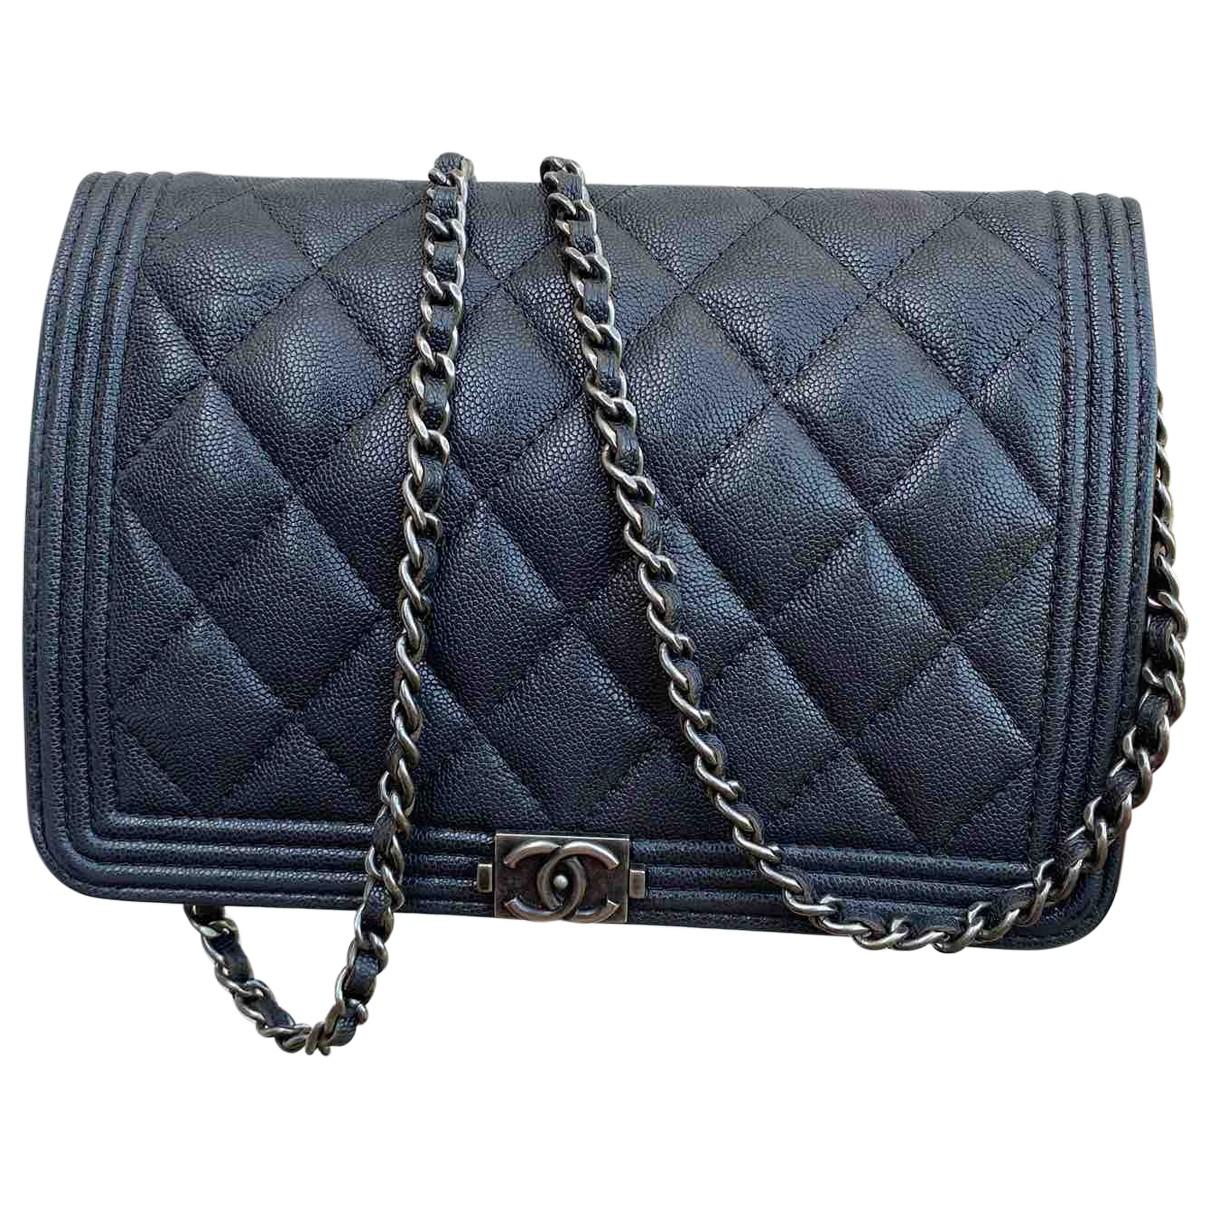 Chanel - Sac a main Wallet on Chain pour femme en cuir - anthracite